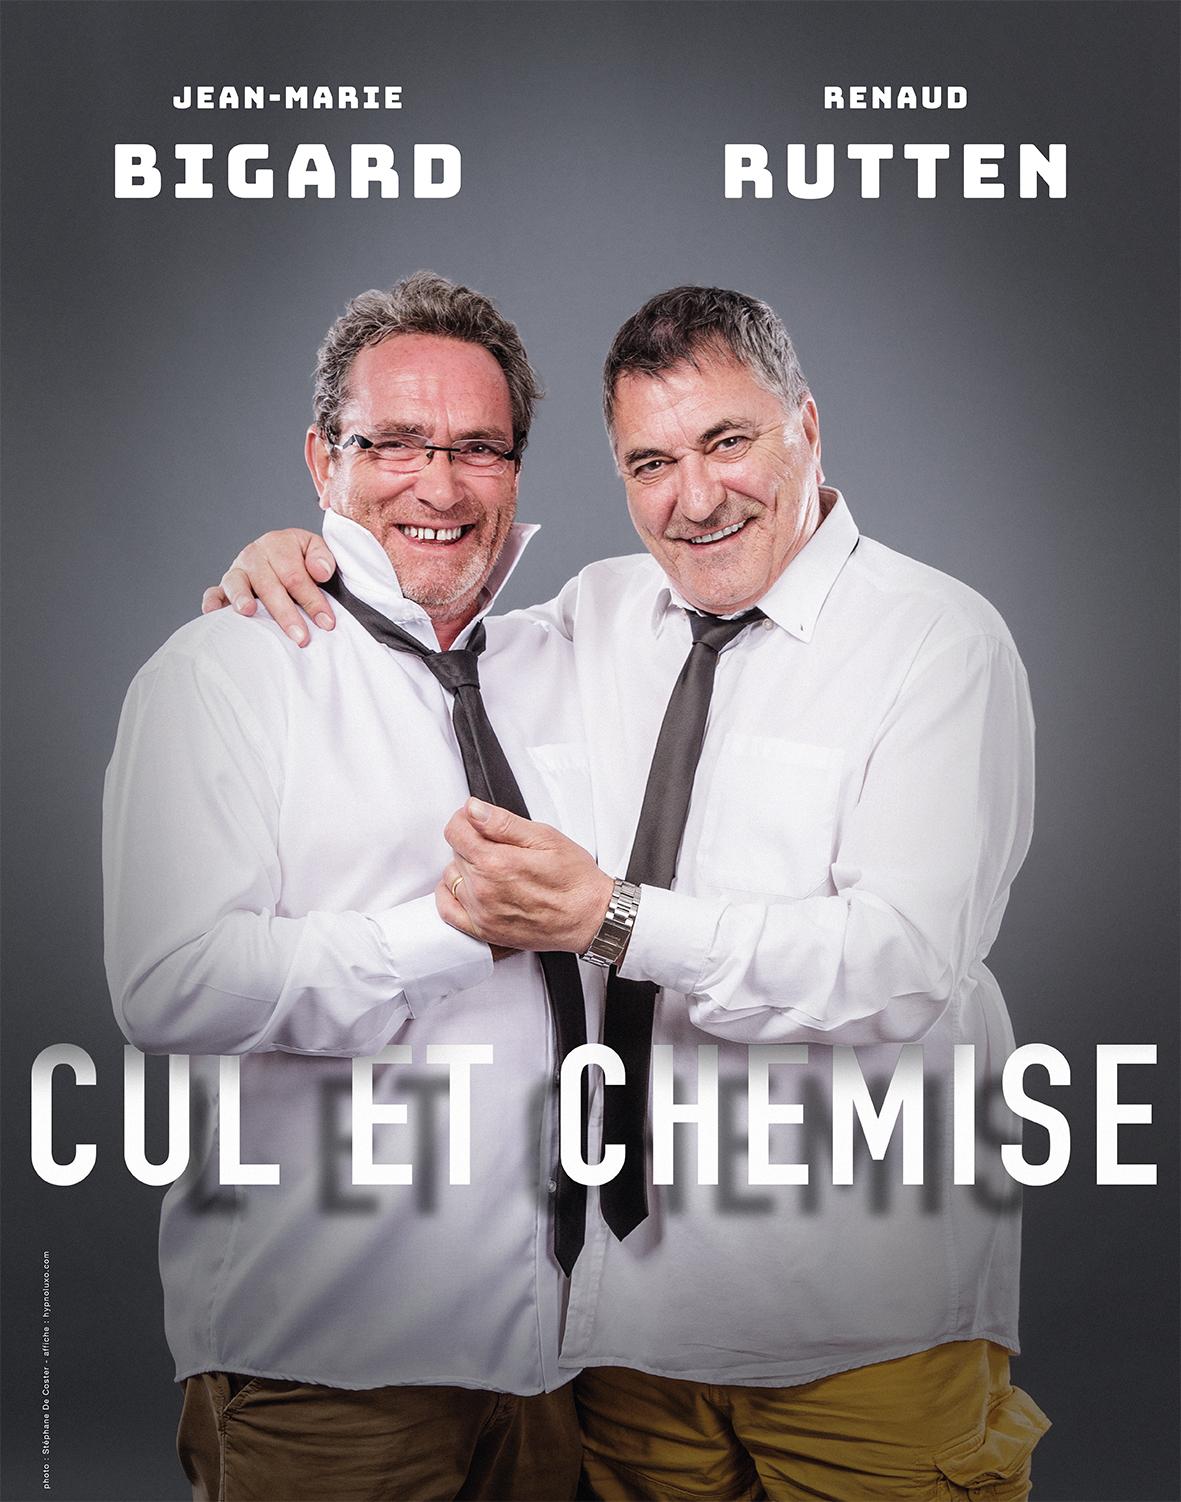 Jean-Marie Bigard et Renaud Rutten : Cul et Chemise